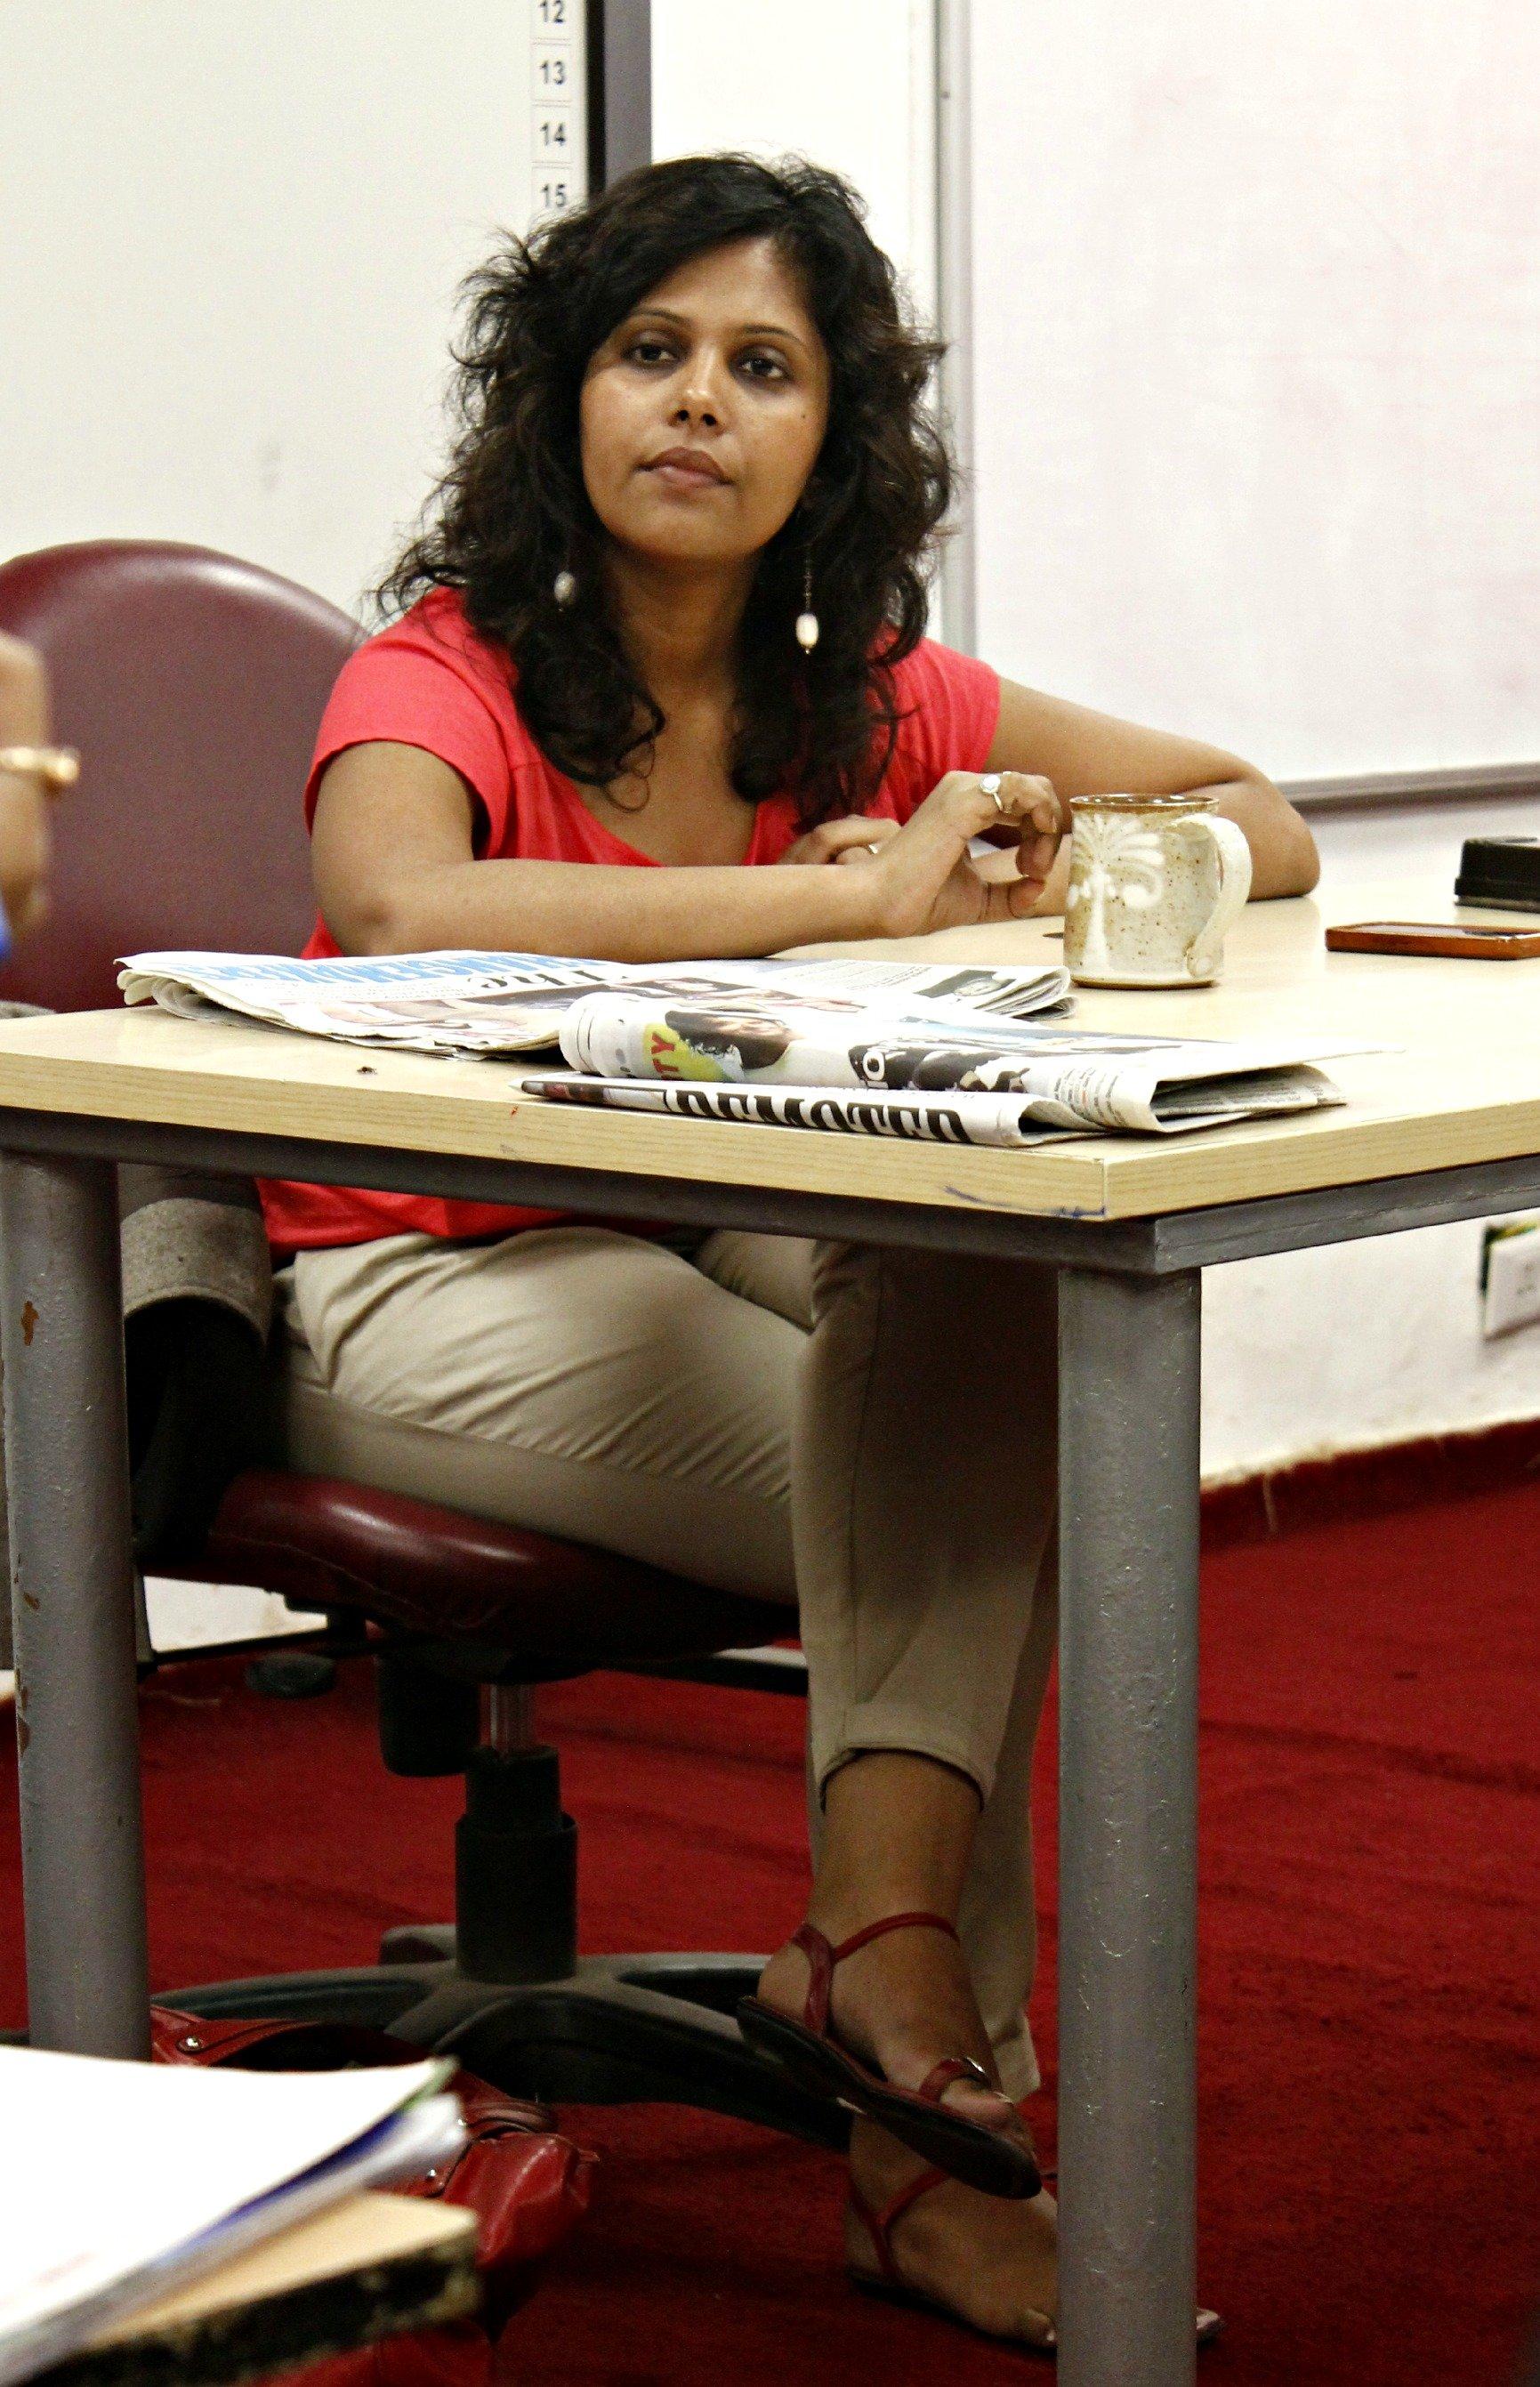 Sunetra Choudhury cute